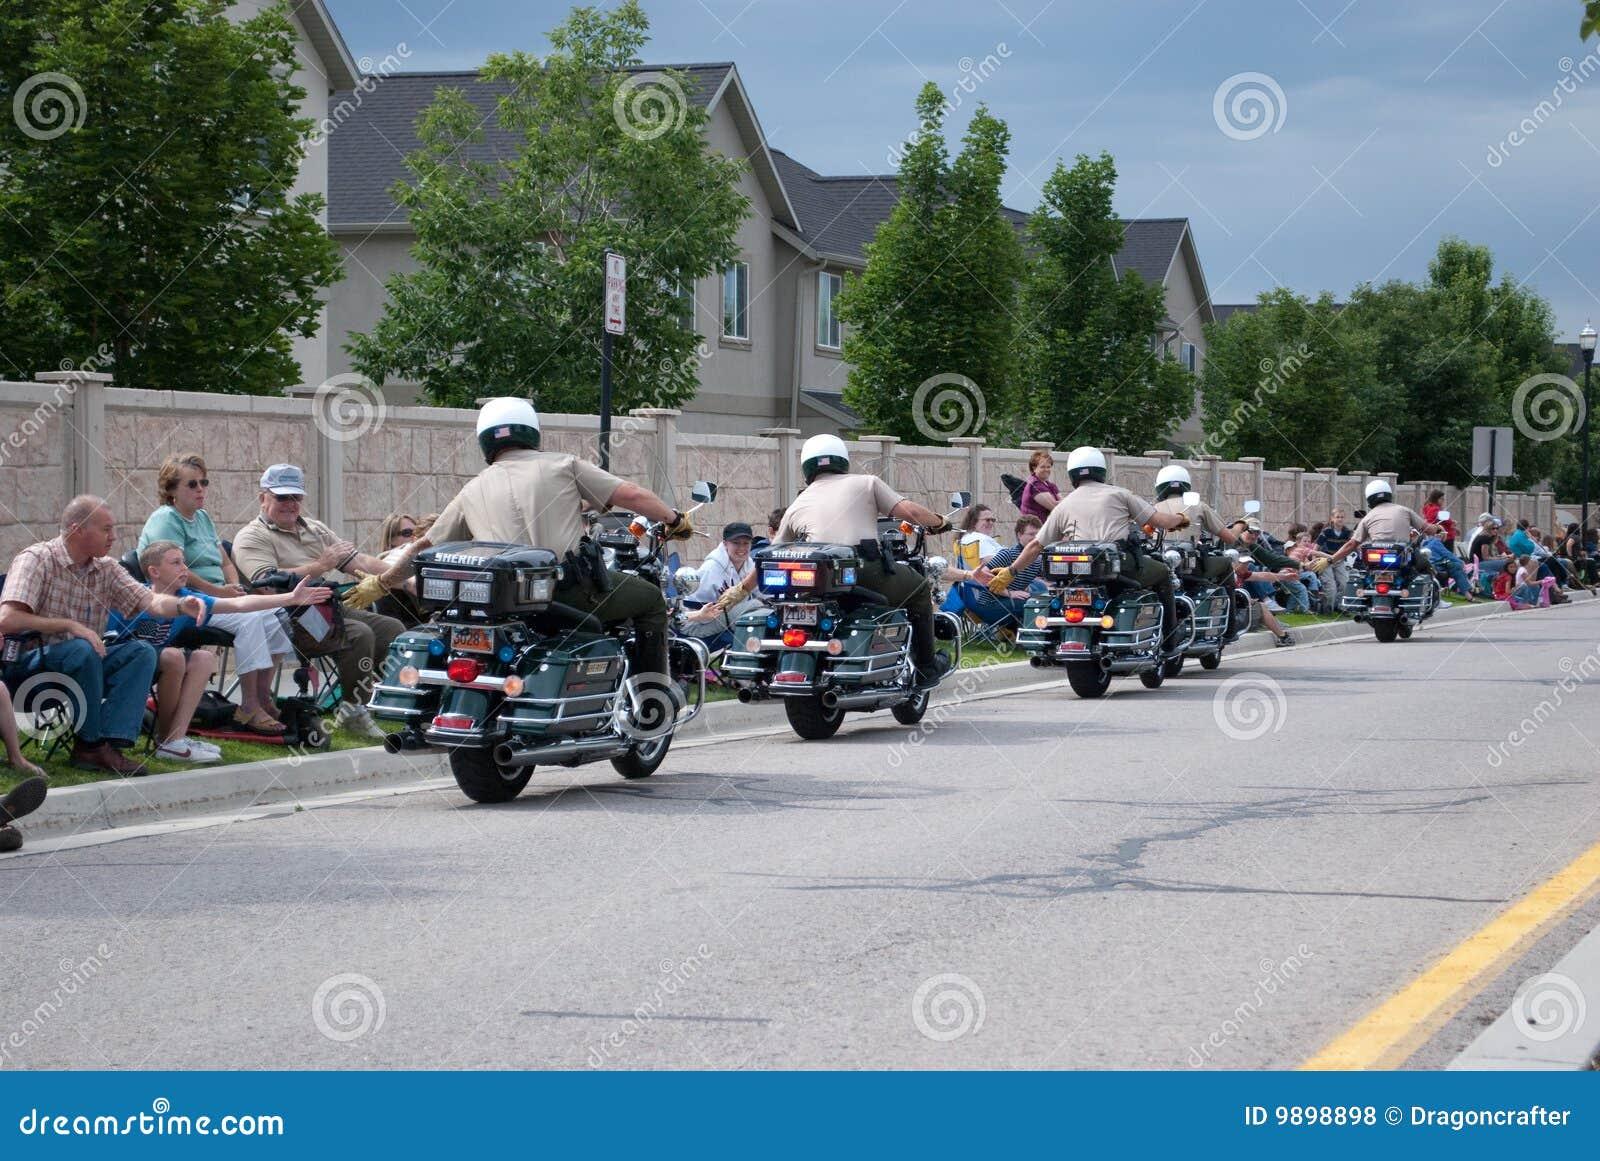 Motor-politie Hoge fiving menigte